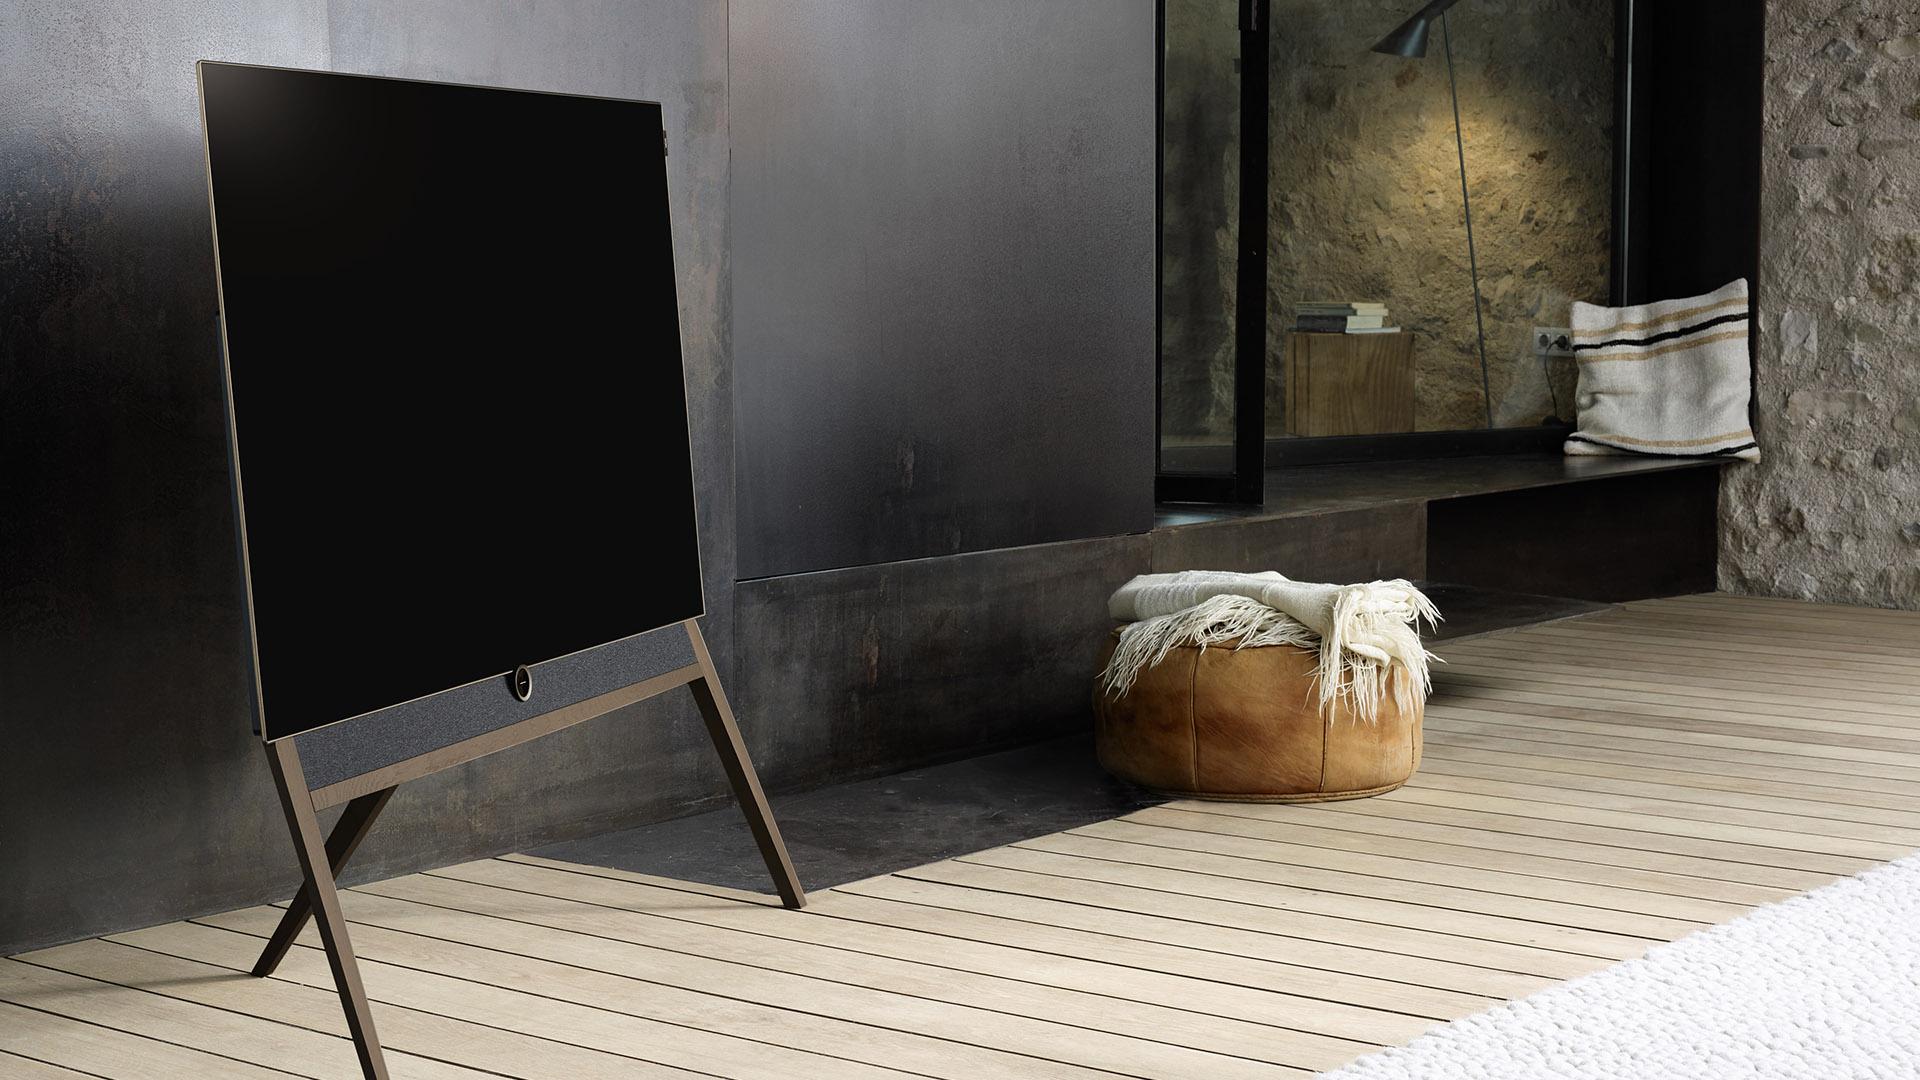 loewe bild oled set scala hifi scala hifi. Black Bedroom Furniture Sets. Home Design Ideas